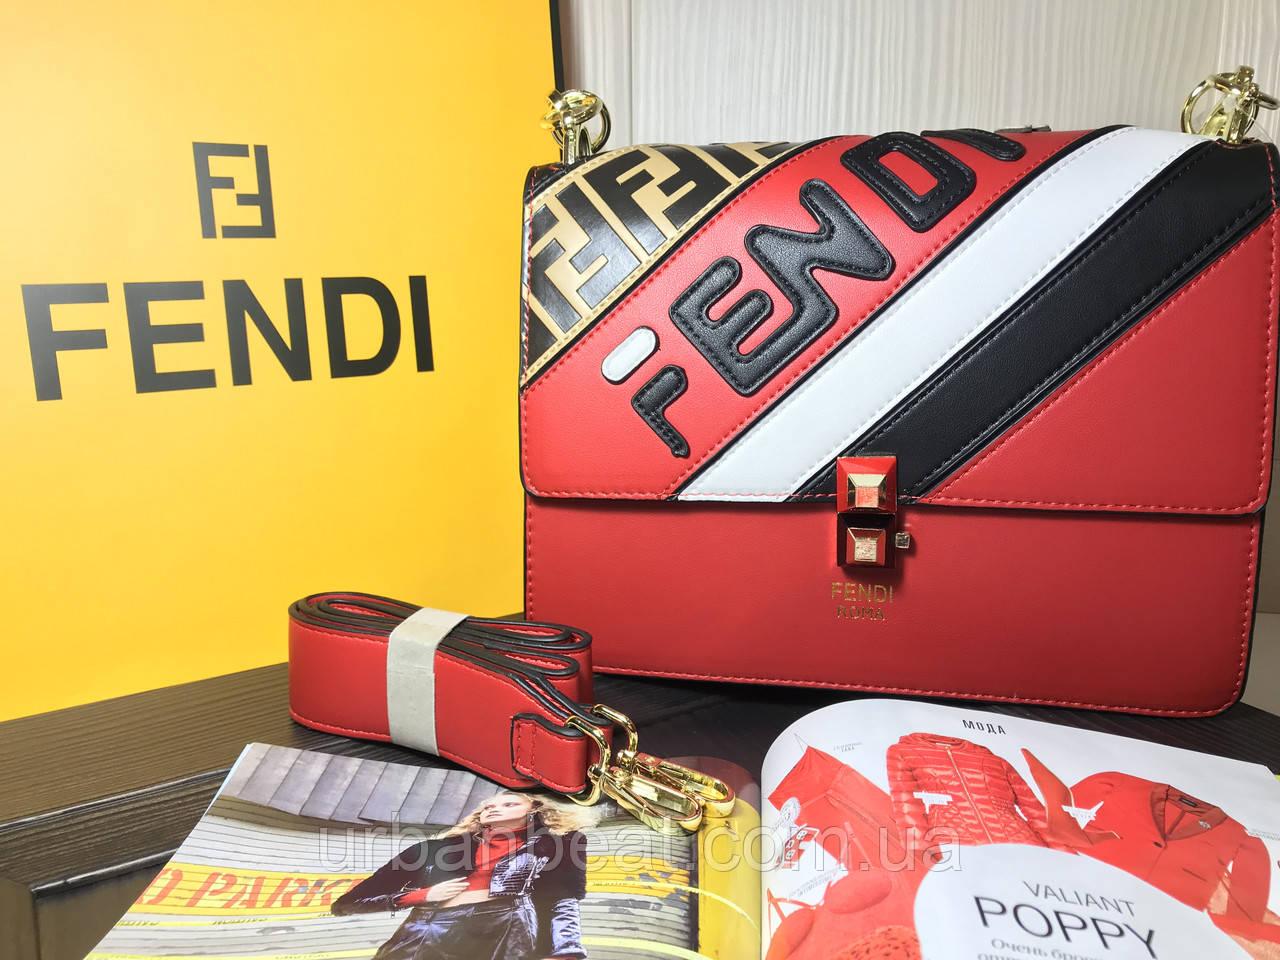 79155056ff5f Женская мини сумка Фенди Mania Kan1 Roma Red (Реплика): продажа ...